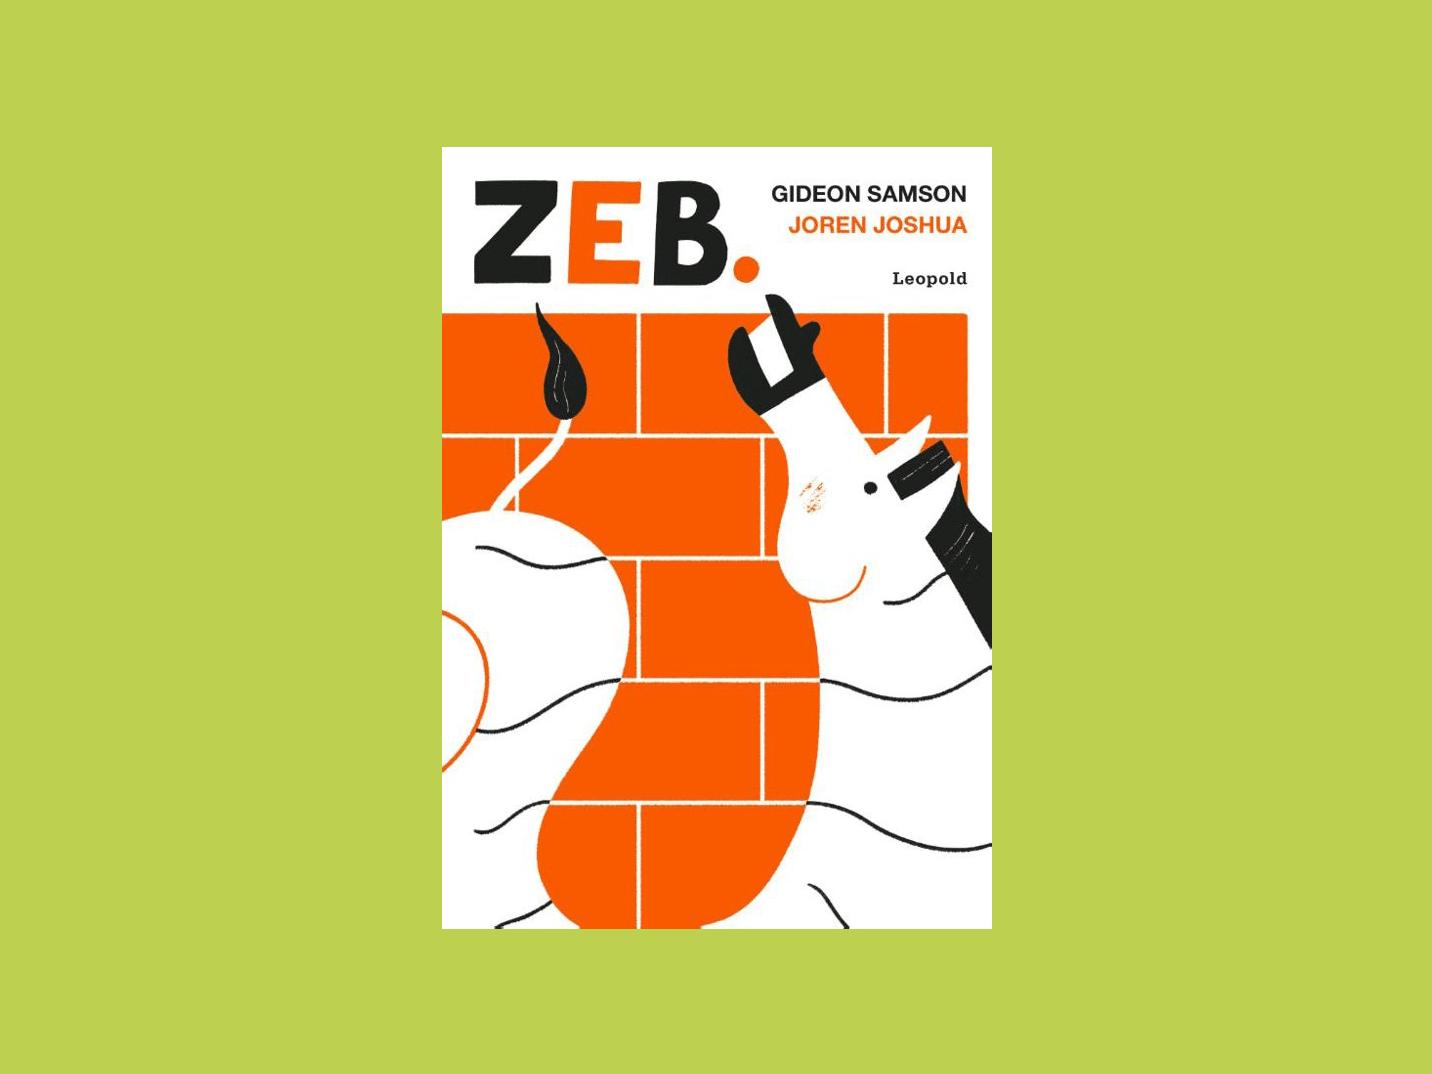 Boekbespreking Zeb.